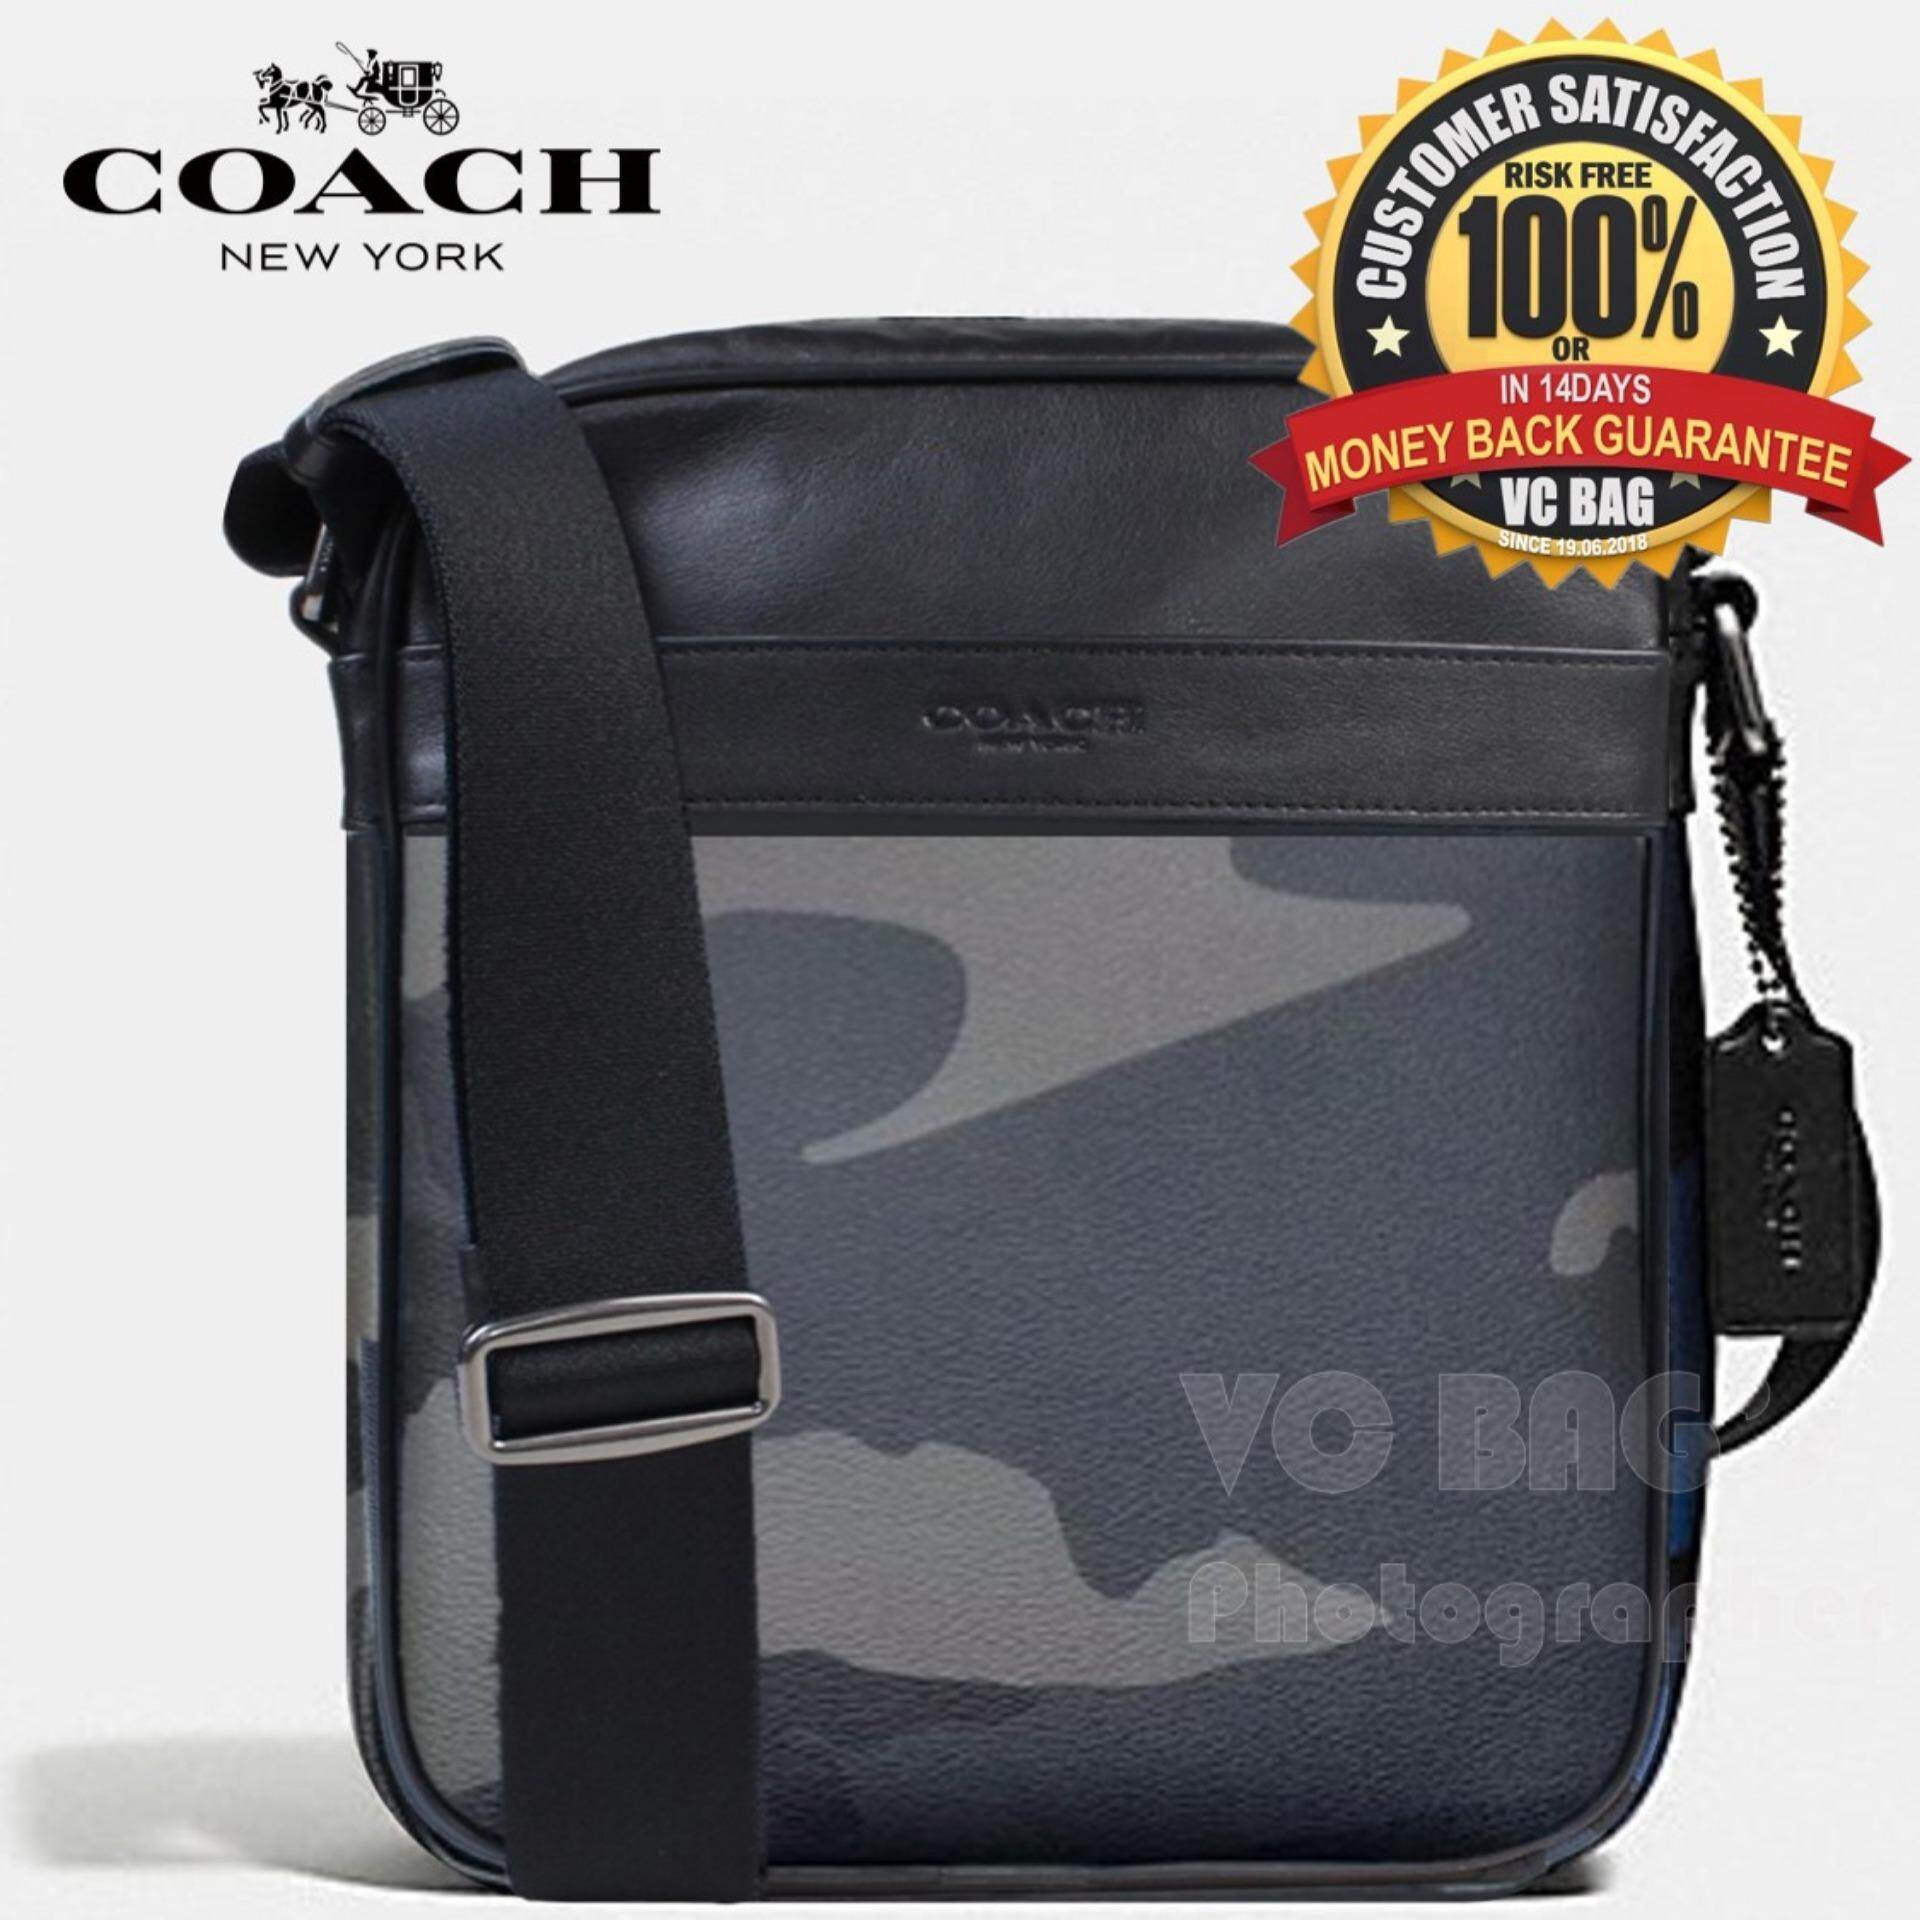 9979f8176354 promo code coach f57564 mens charles flight bag in indigo camo grey 5ce70  1537f